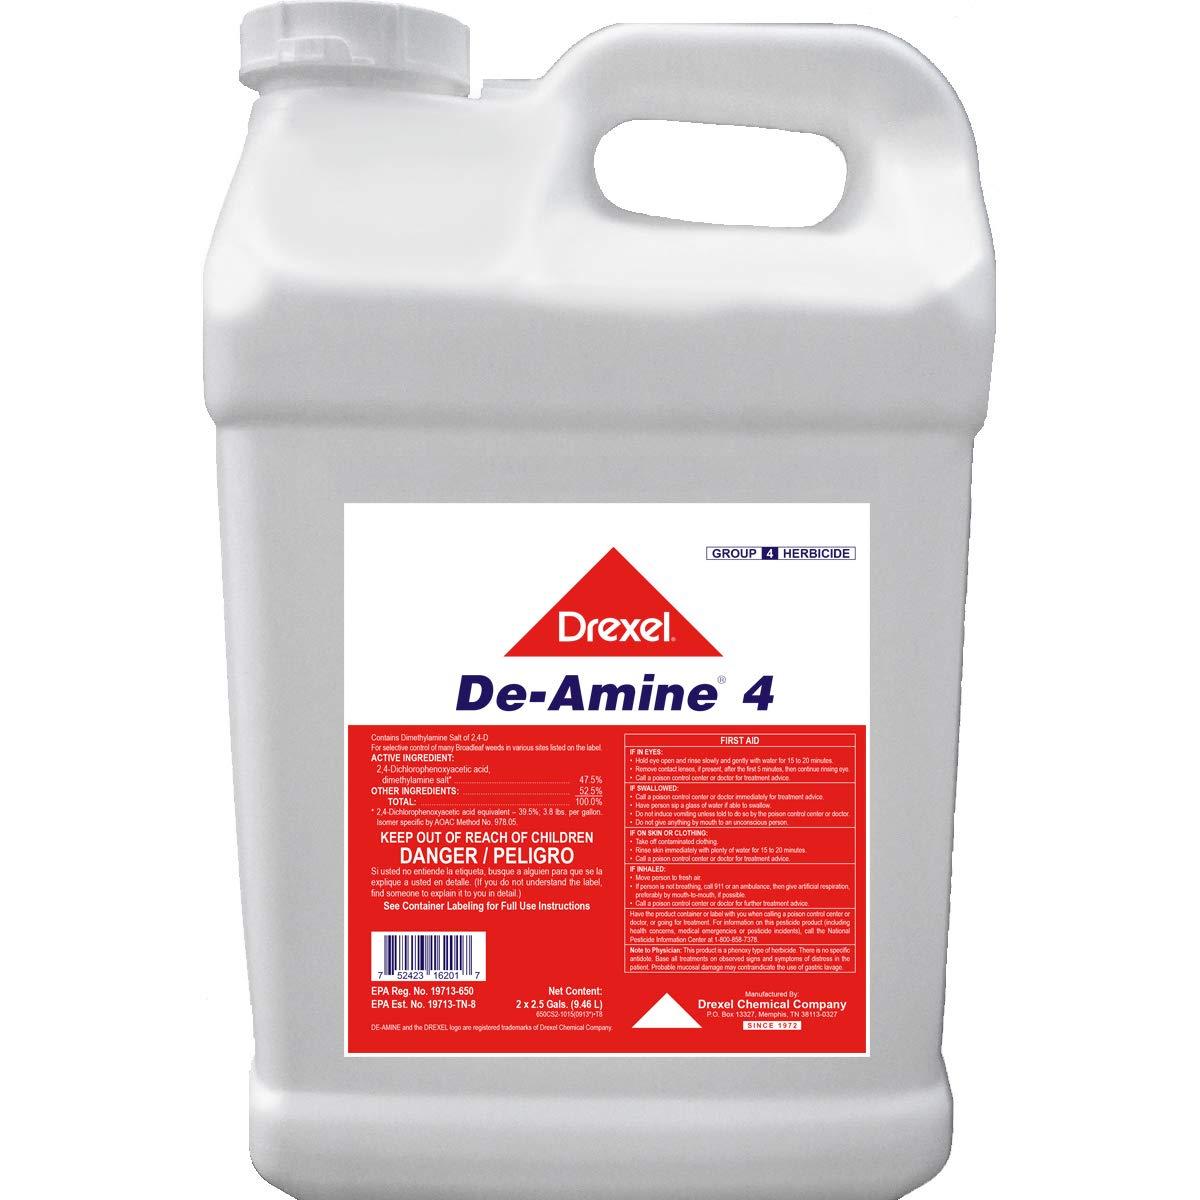 Southern Ag Drexel De-Amine 4 -Same As- 2, 4-D Amine Weed Killer, 128oz - Gallon by Southern Ag